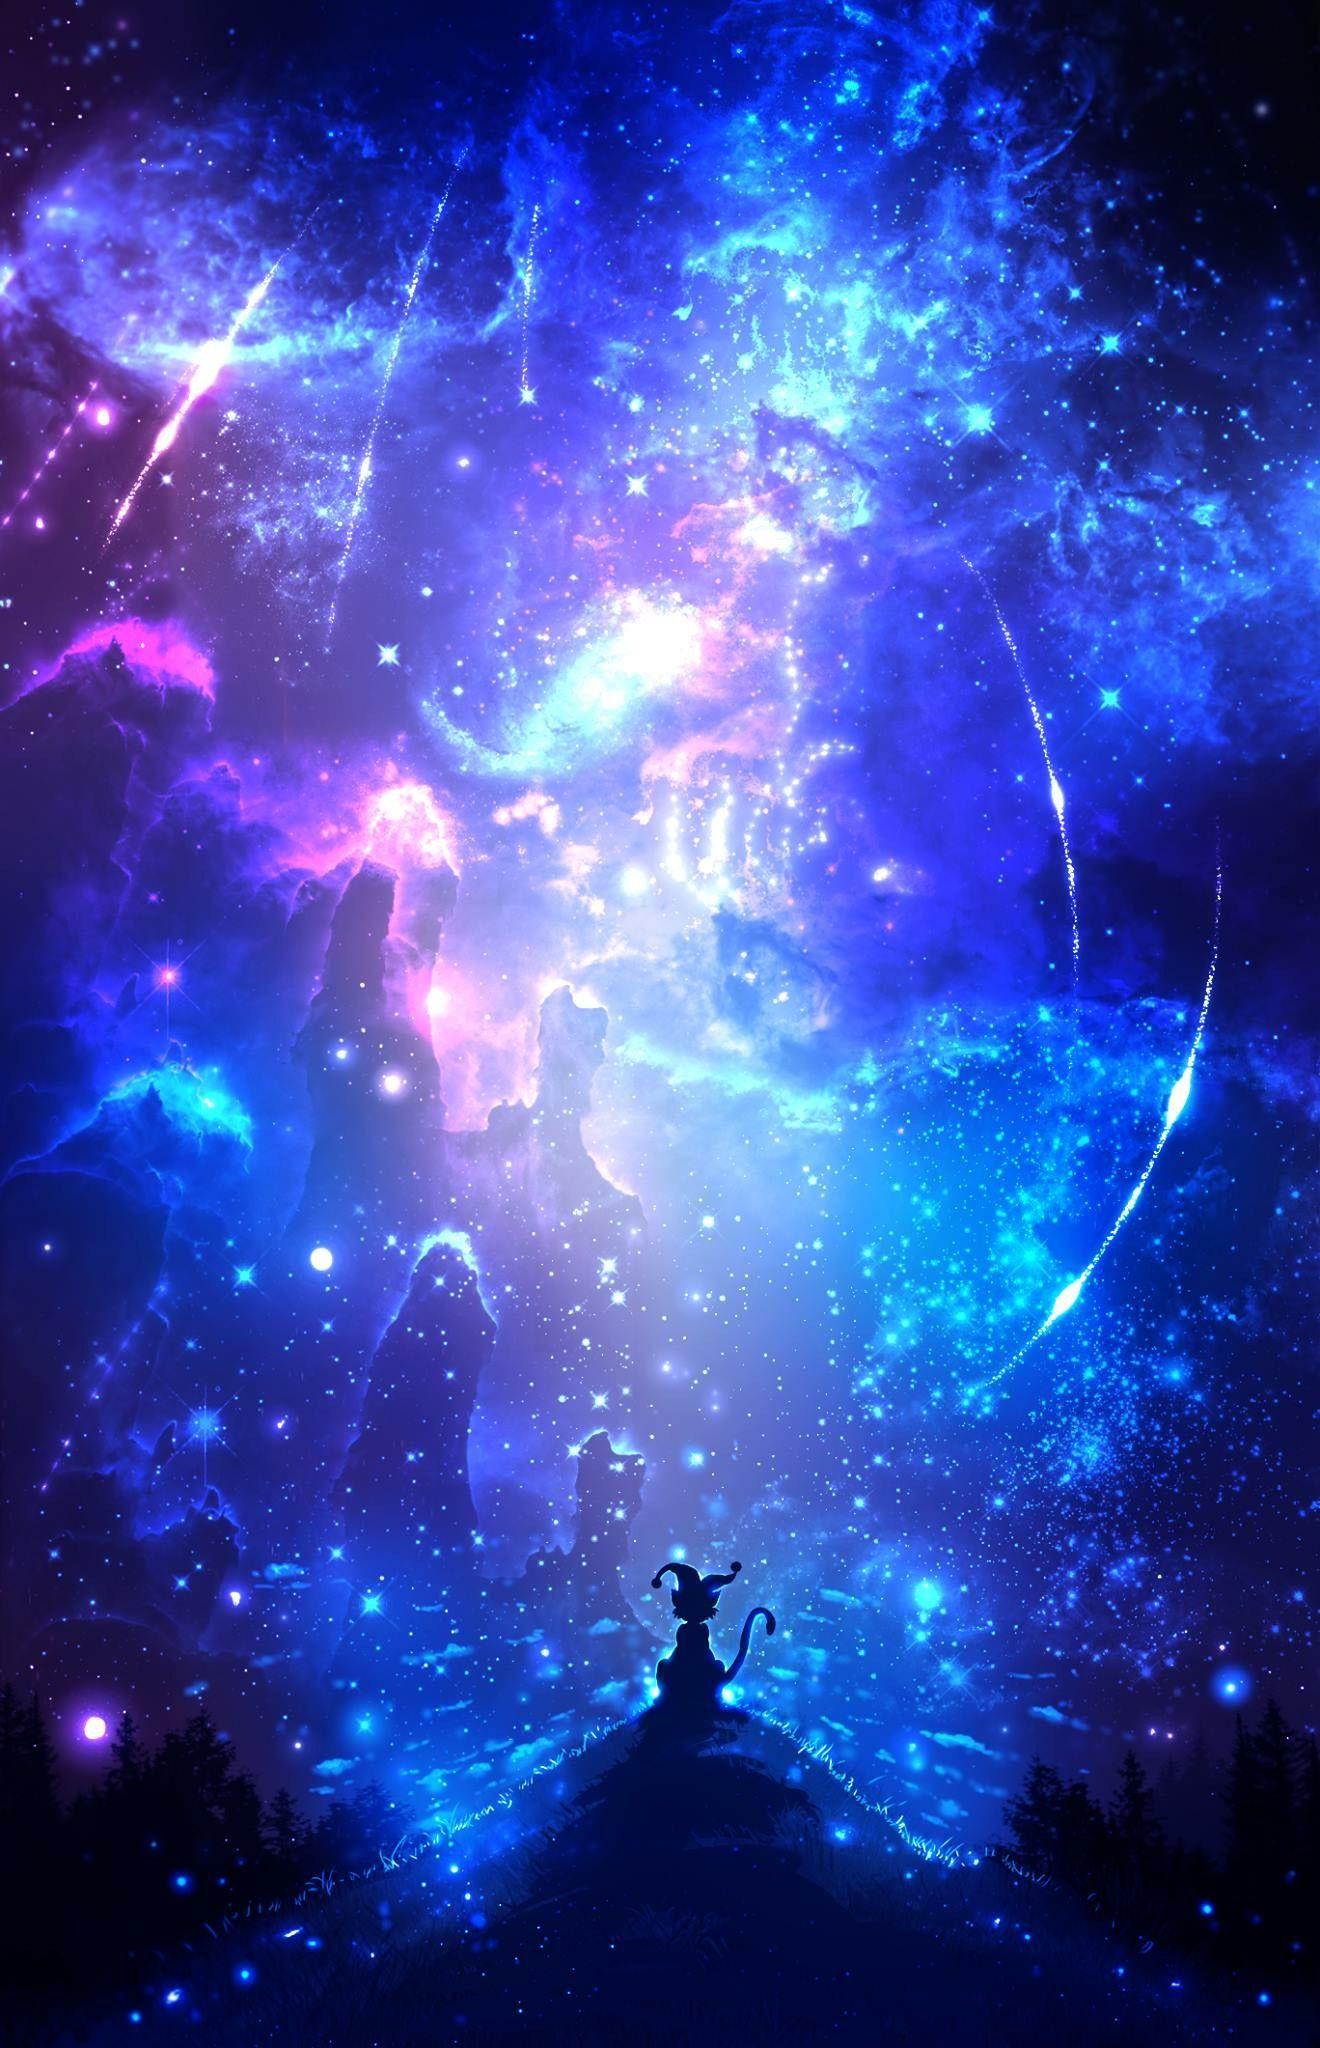 Starlight Paisaje de fantasía, Arte de galaxia, Arte de